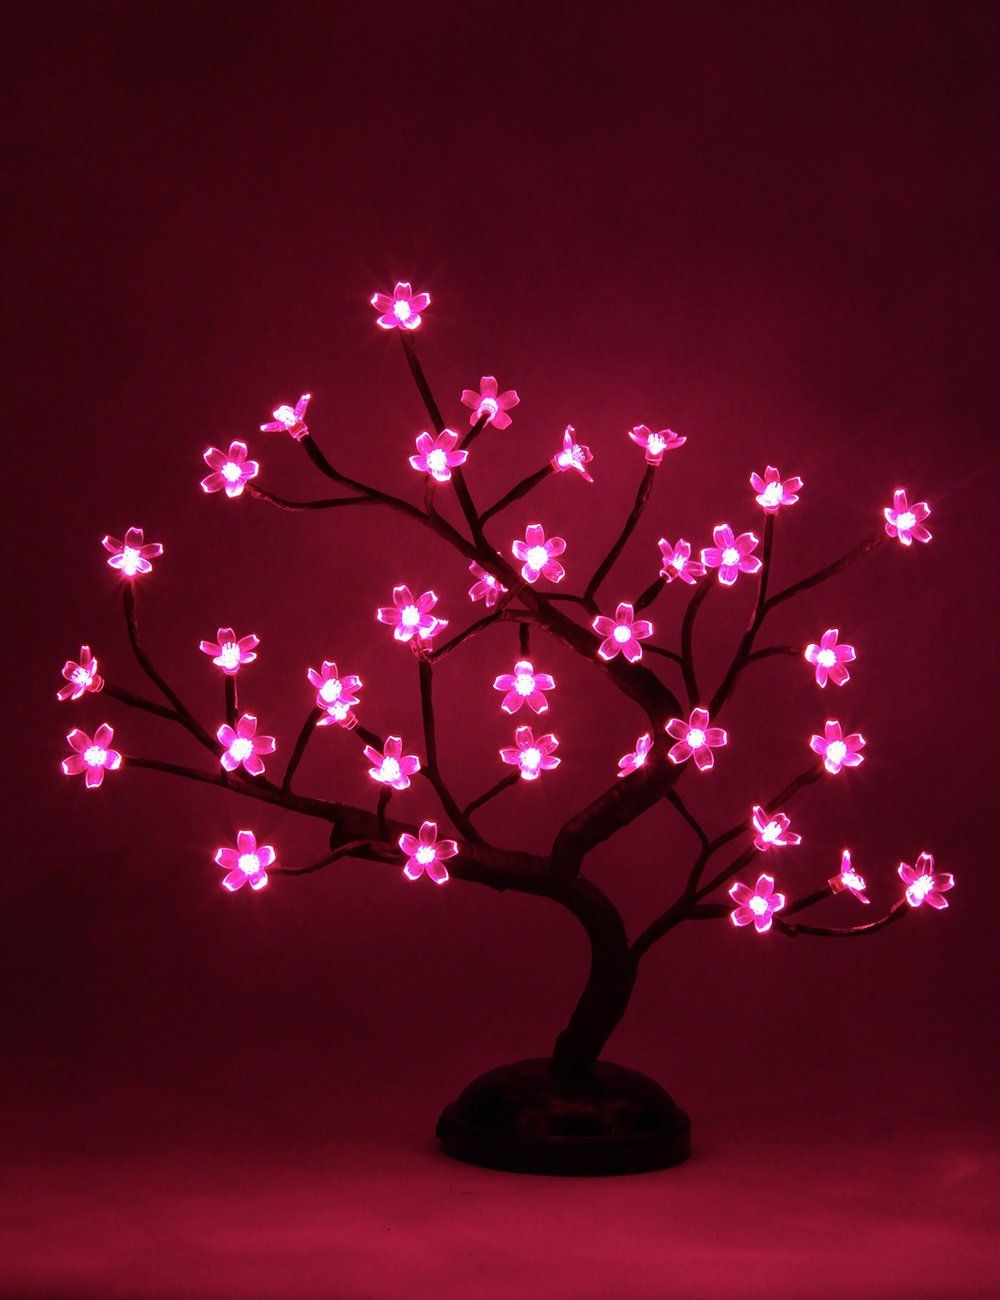 Lightshare New 16inch 36led Cherry Blossom Bonsai Light Pink Light Battery Powered For Home Decoration Christmas Night Light Cute Night Lights Decor